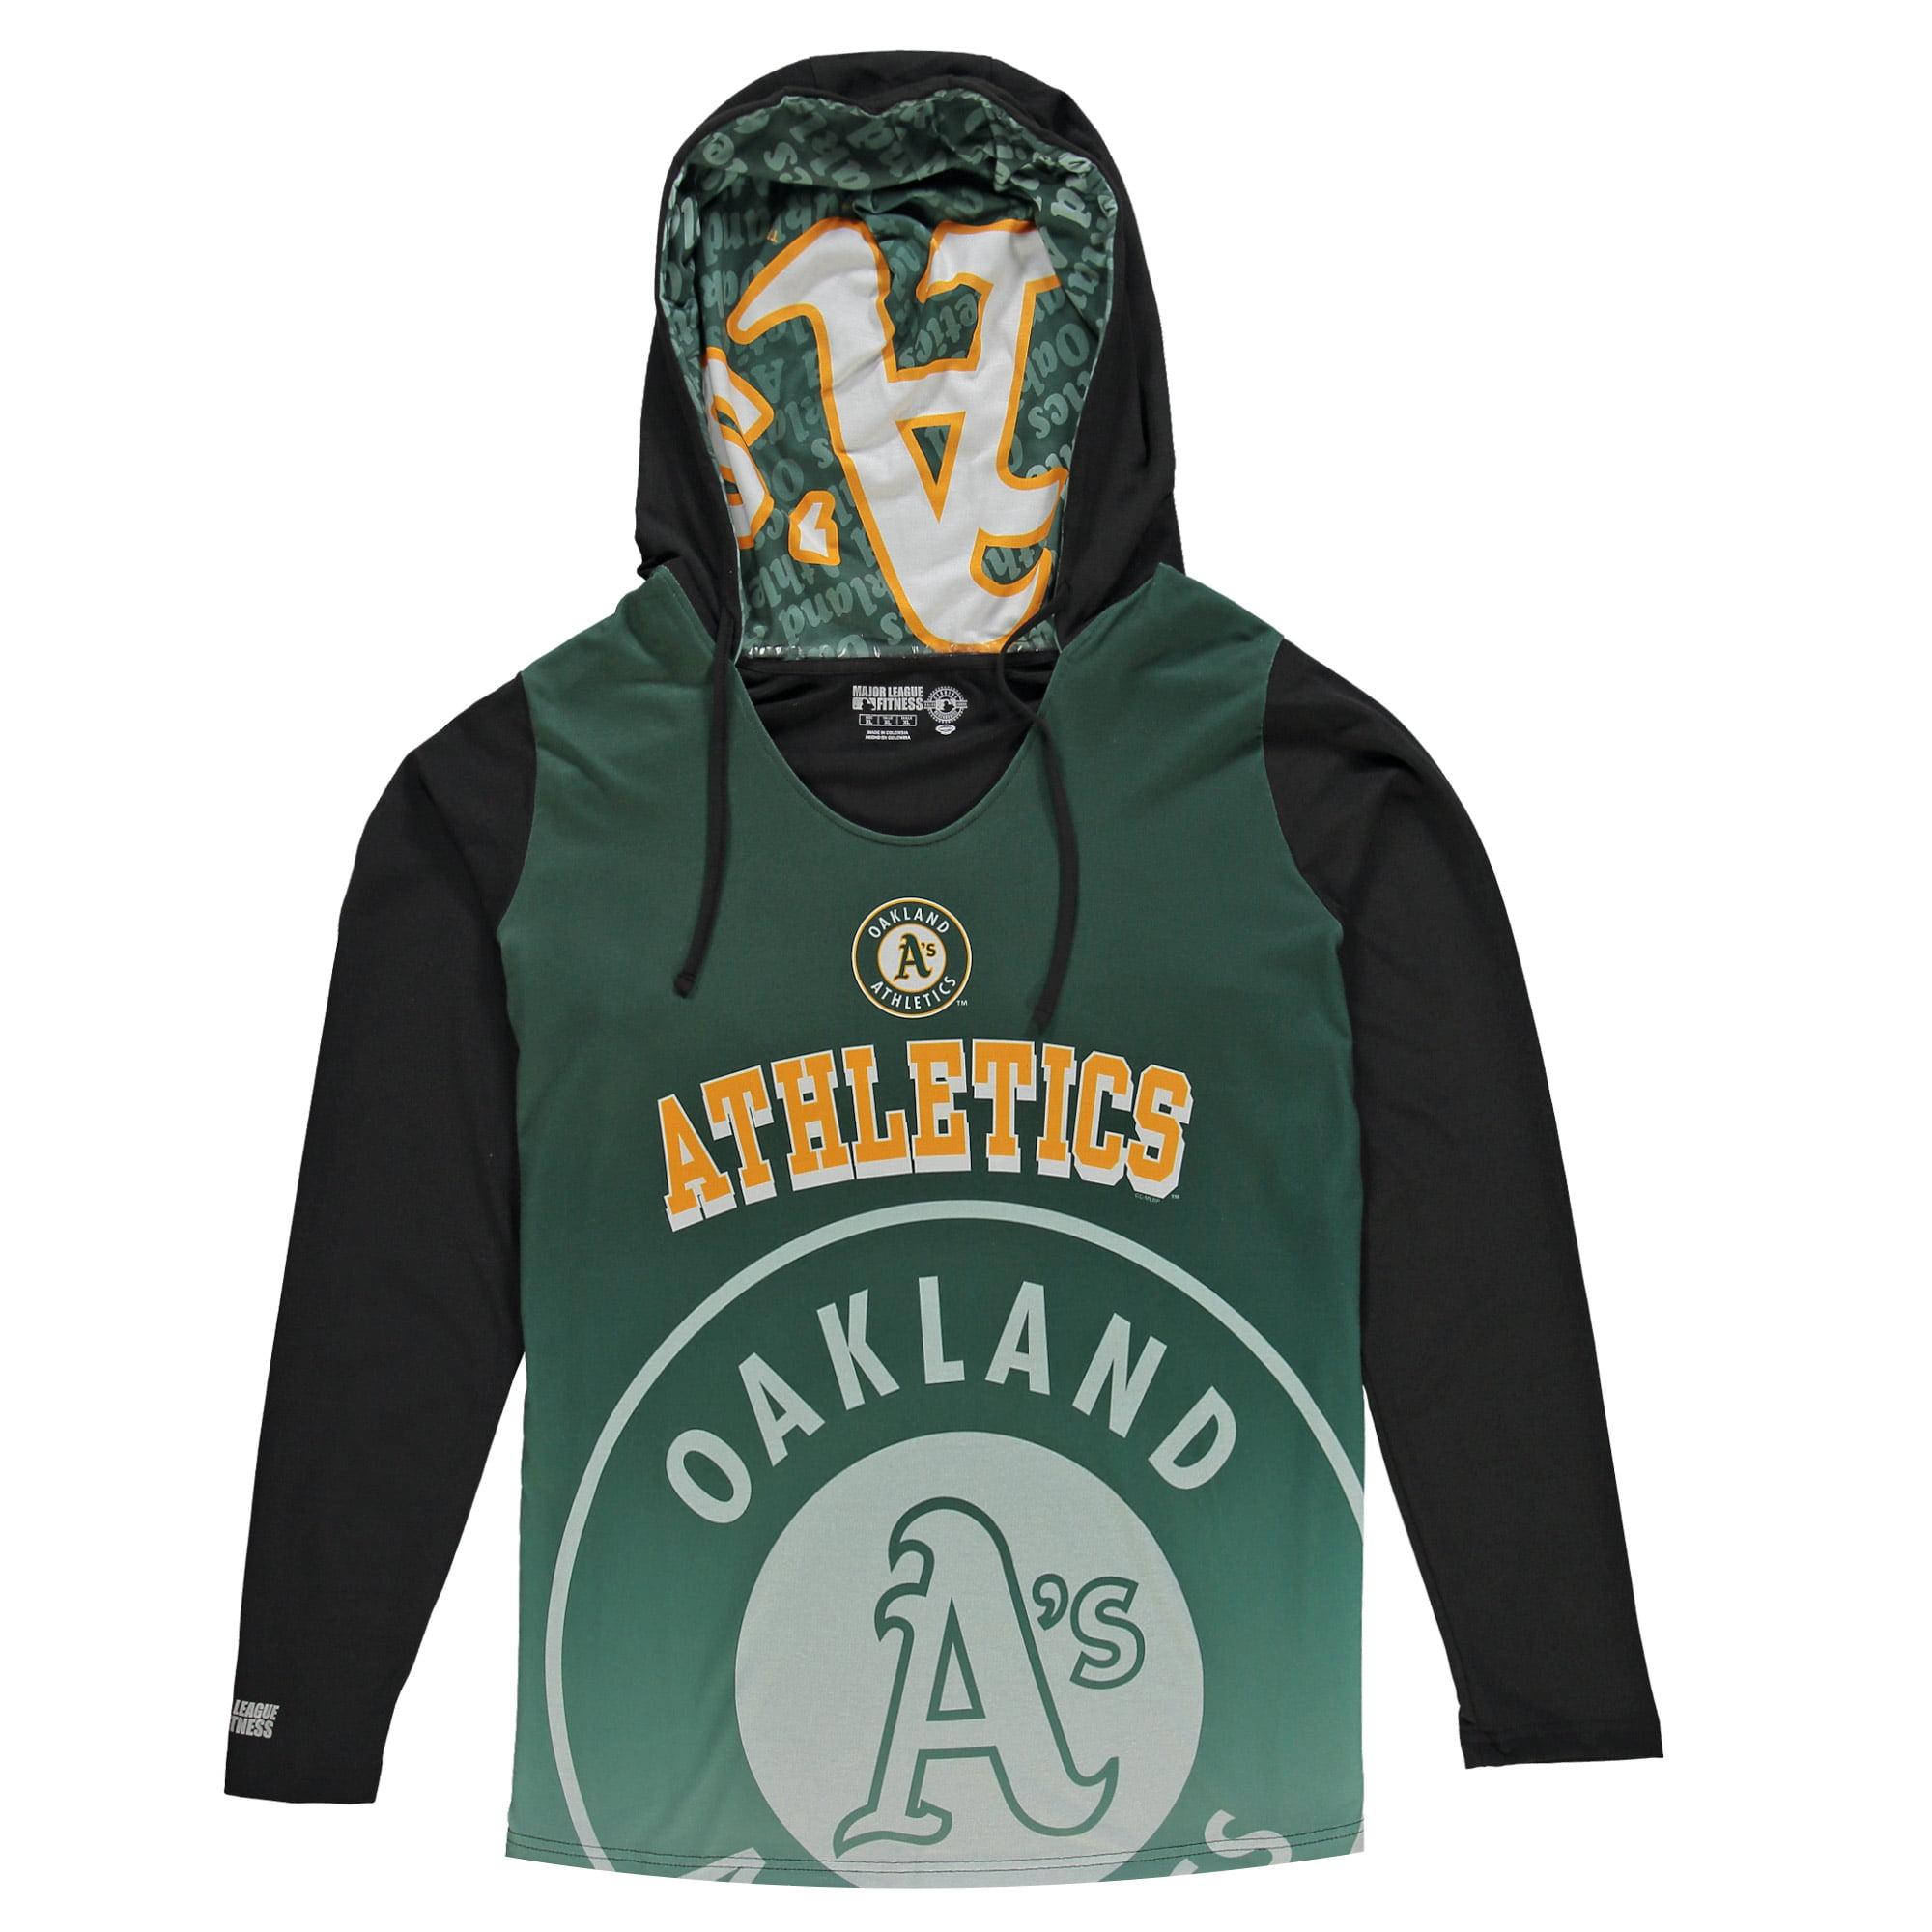 Oakland Athletics Concepts Sport Women's Long Sleeve Hooded Sweatshirt - Green